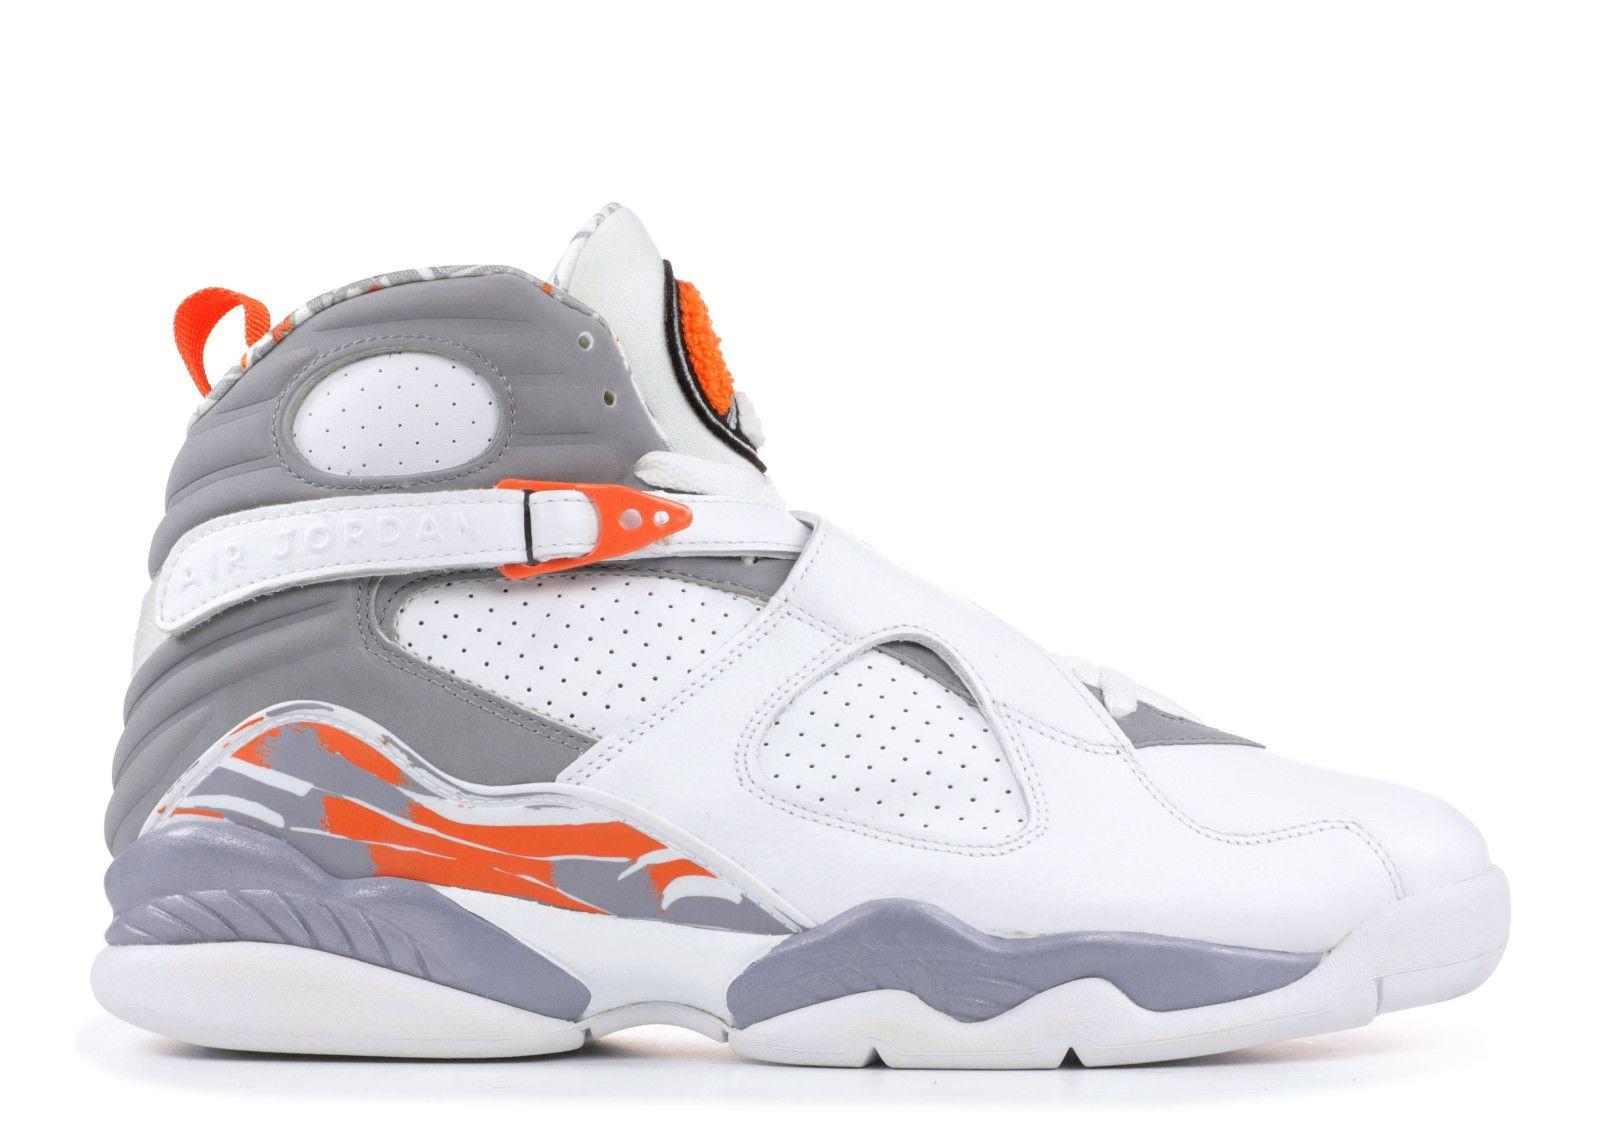 new product 0de12 ac0db Air Jordan 8 (VIII) Retro - White   Orange Blaze - Silver - Stealth    Sneaker Wish List   Nike air jordan 8, Nike air jordans, Air jordans